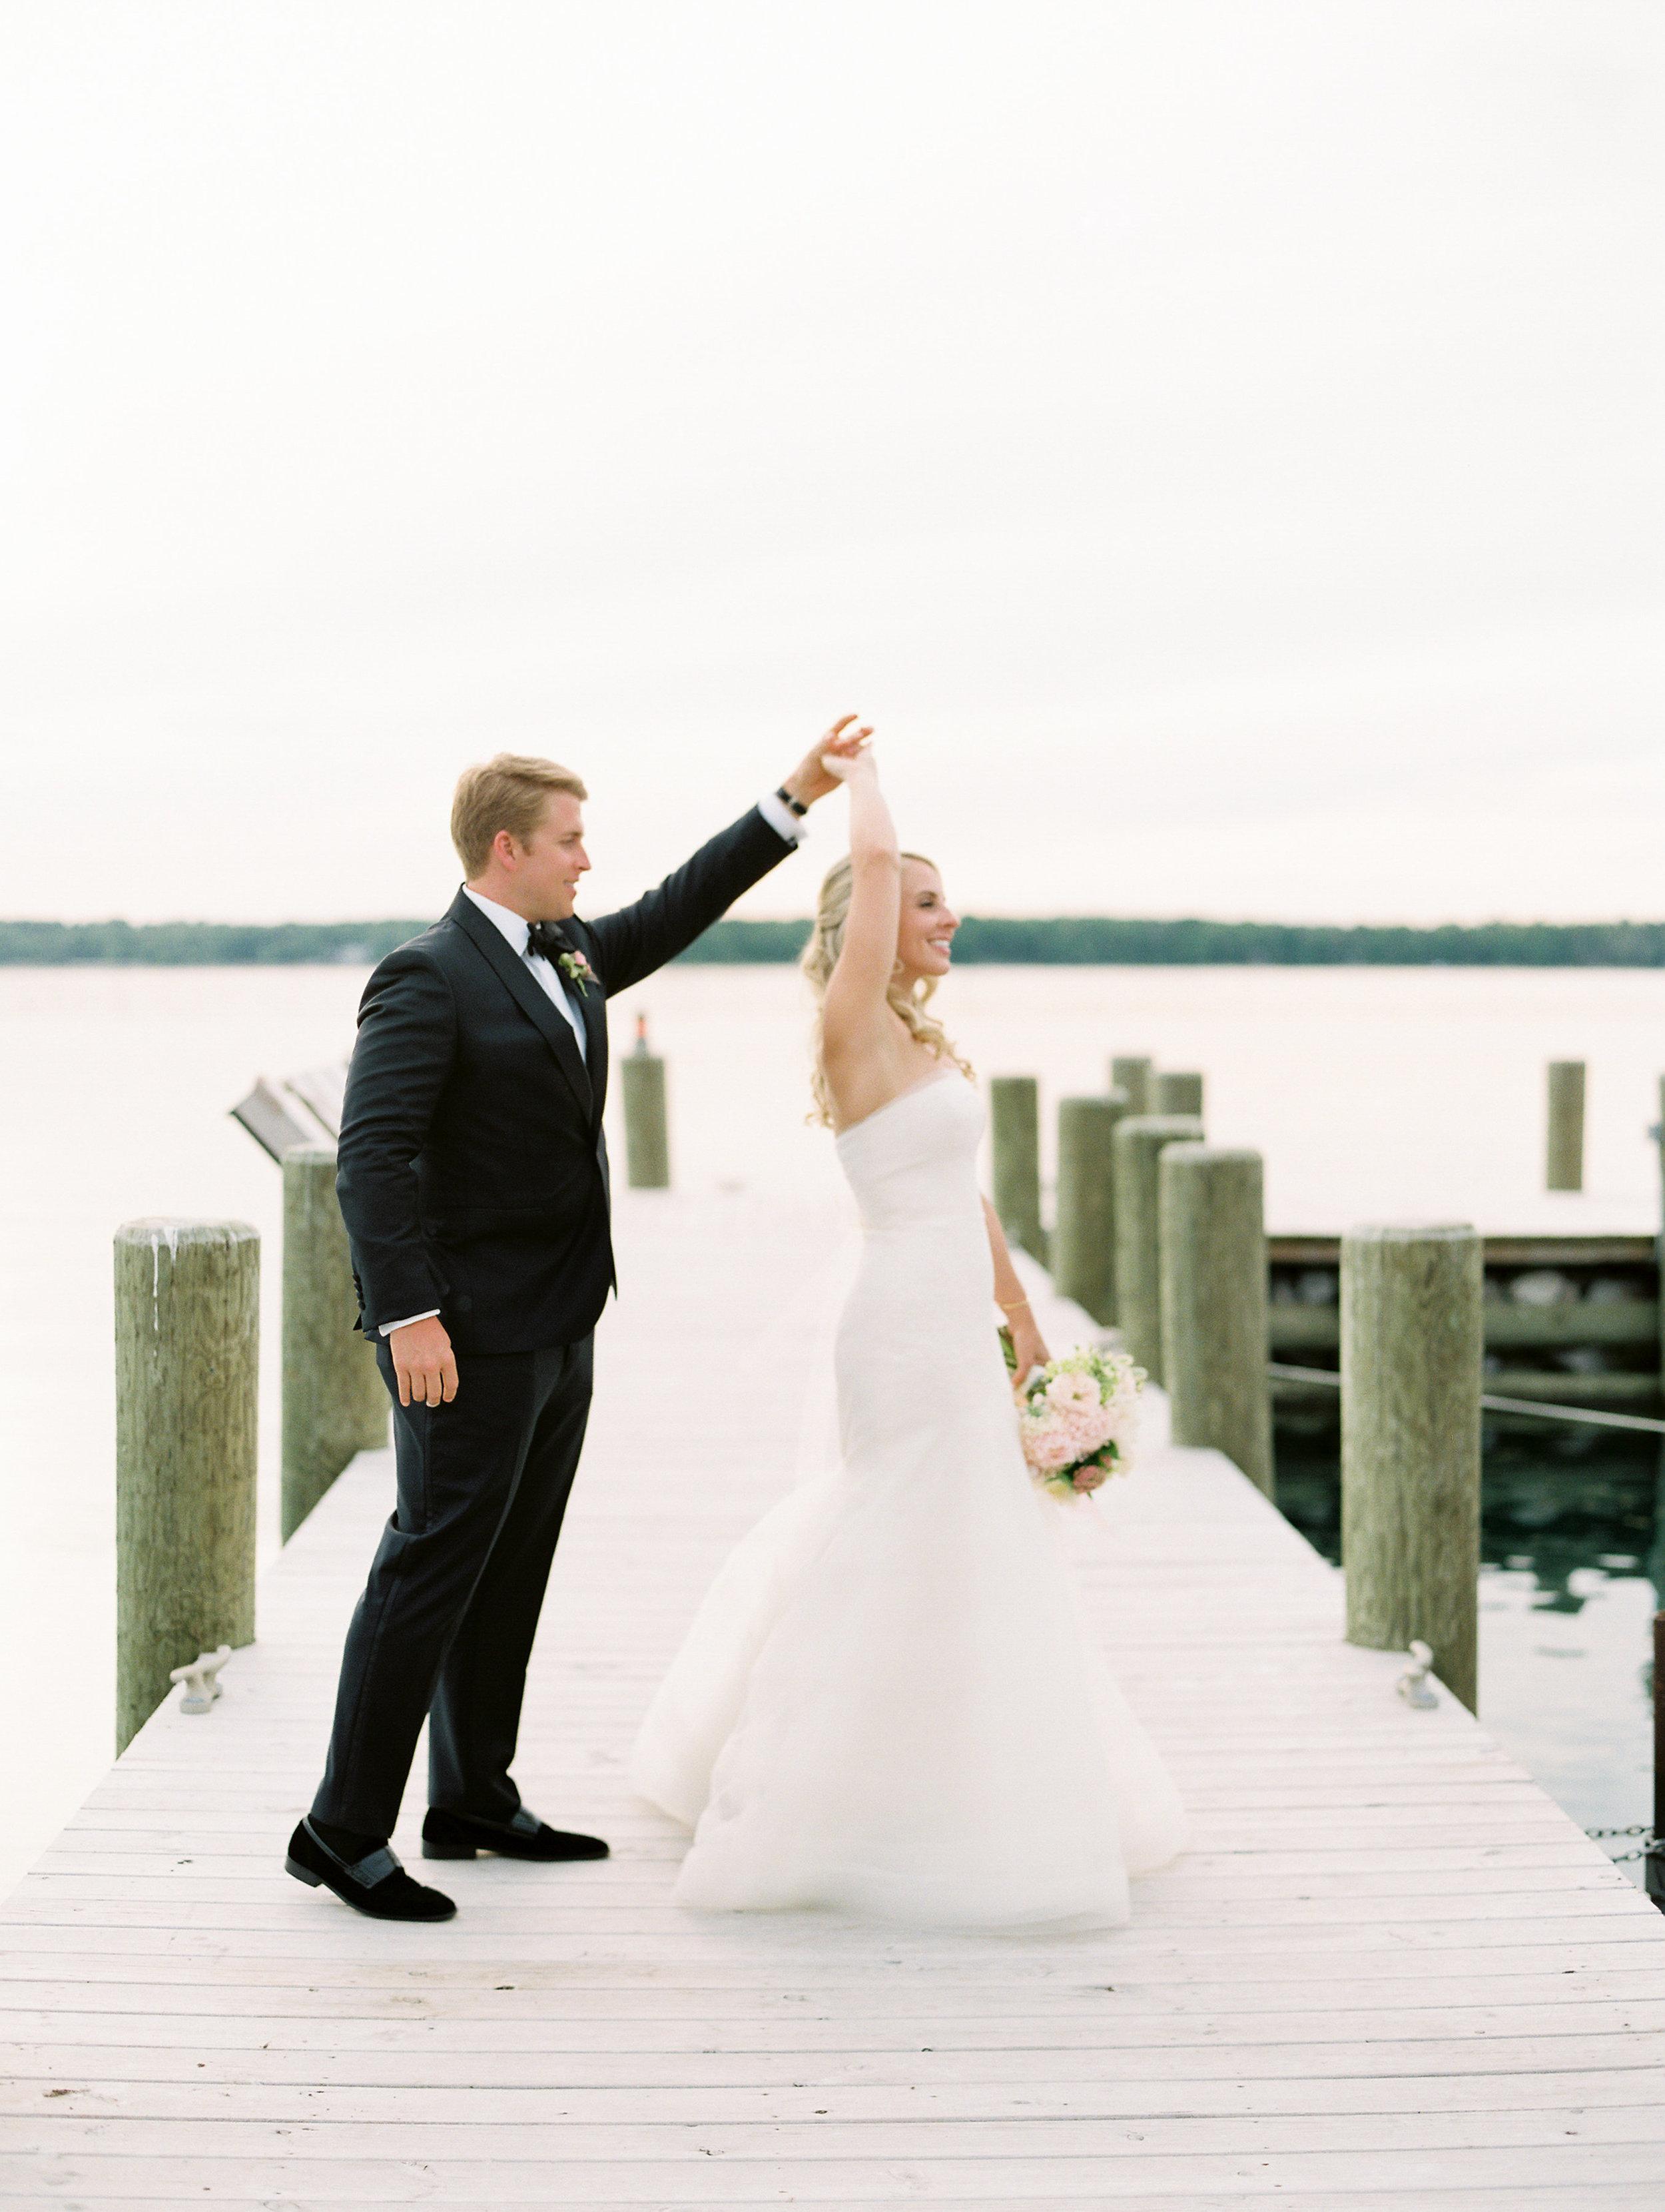 Coffman+Wedding+Bride+Groom+Sunset-82.jpg